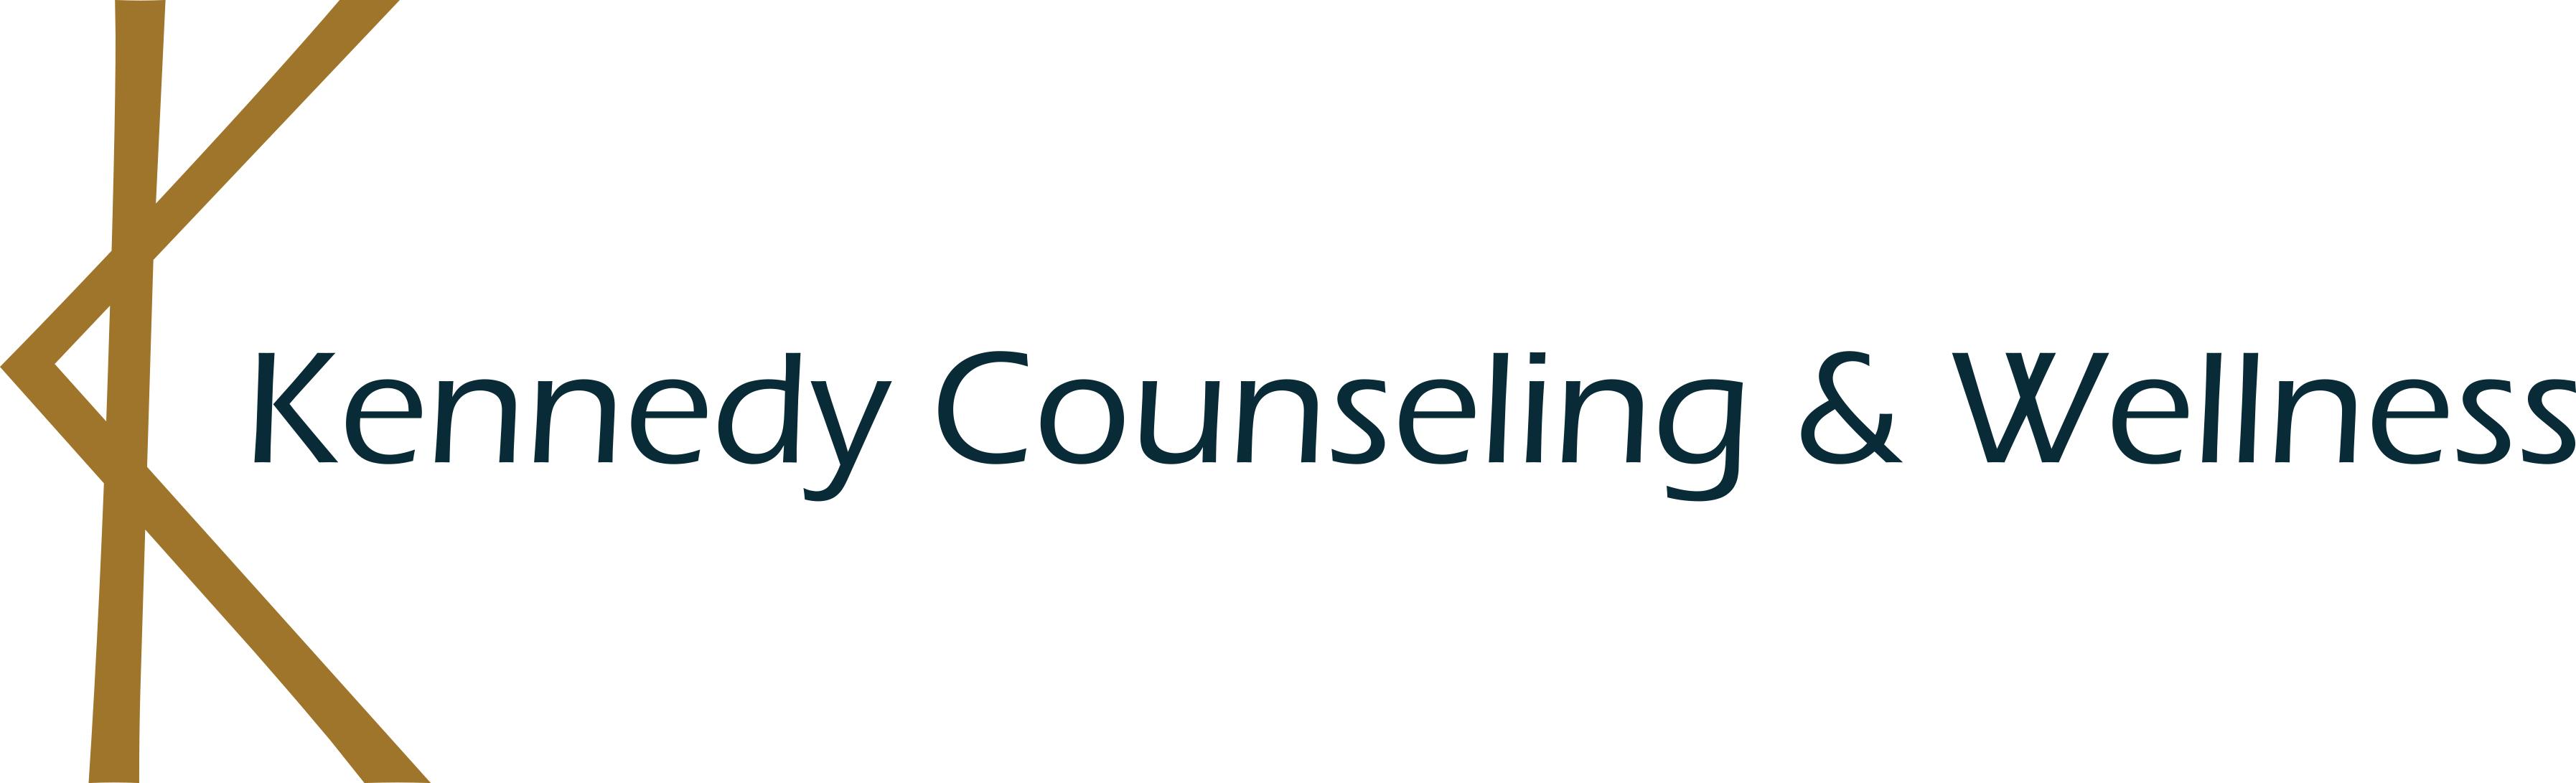 Kennedy Counseling & Wellness